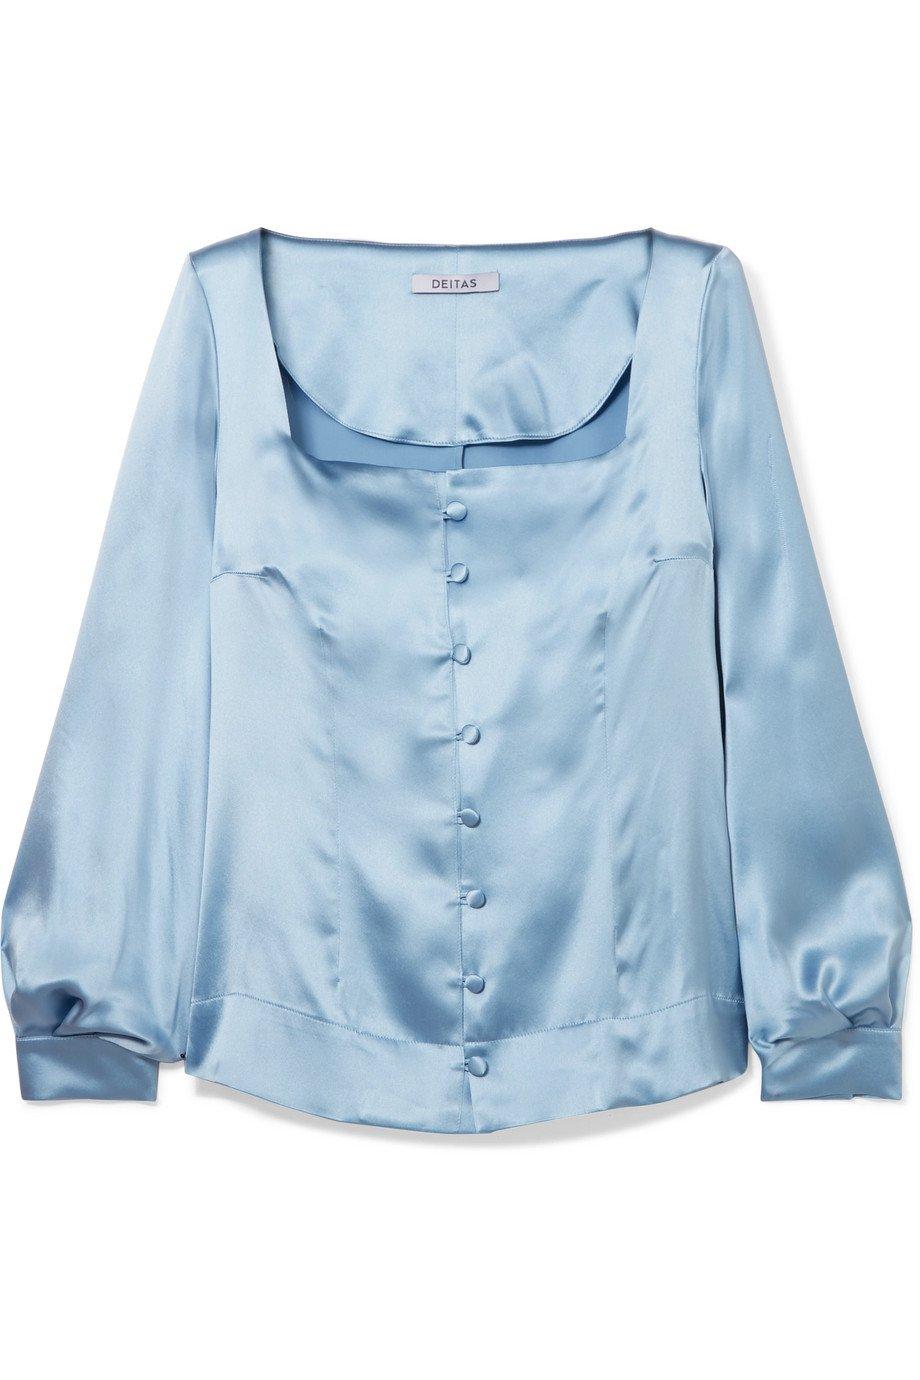 Deitas   Gaia silk-satin blouse   NET-A-PORTER.COM